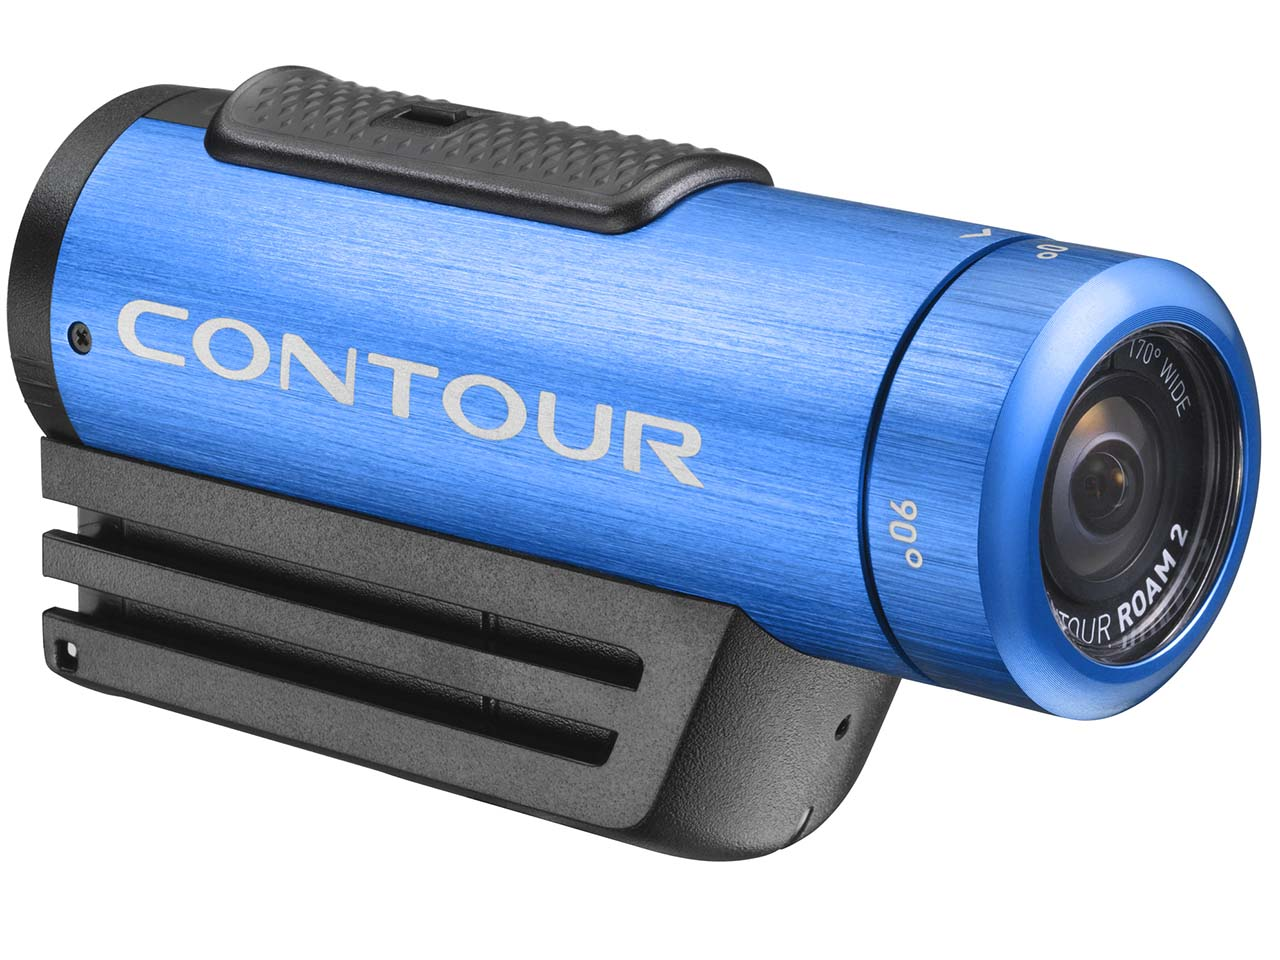 2013 Yamaha Dealers to offer Contour HD Video Cameras | ATV ...